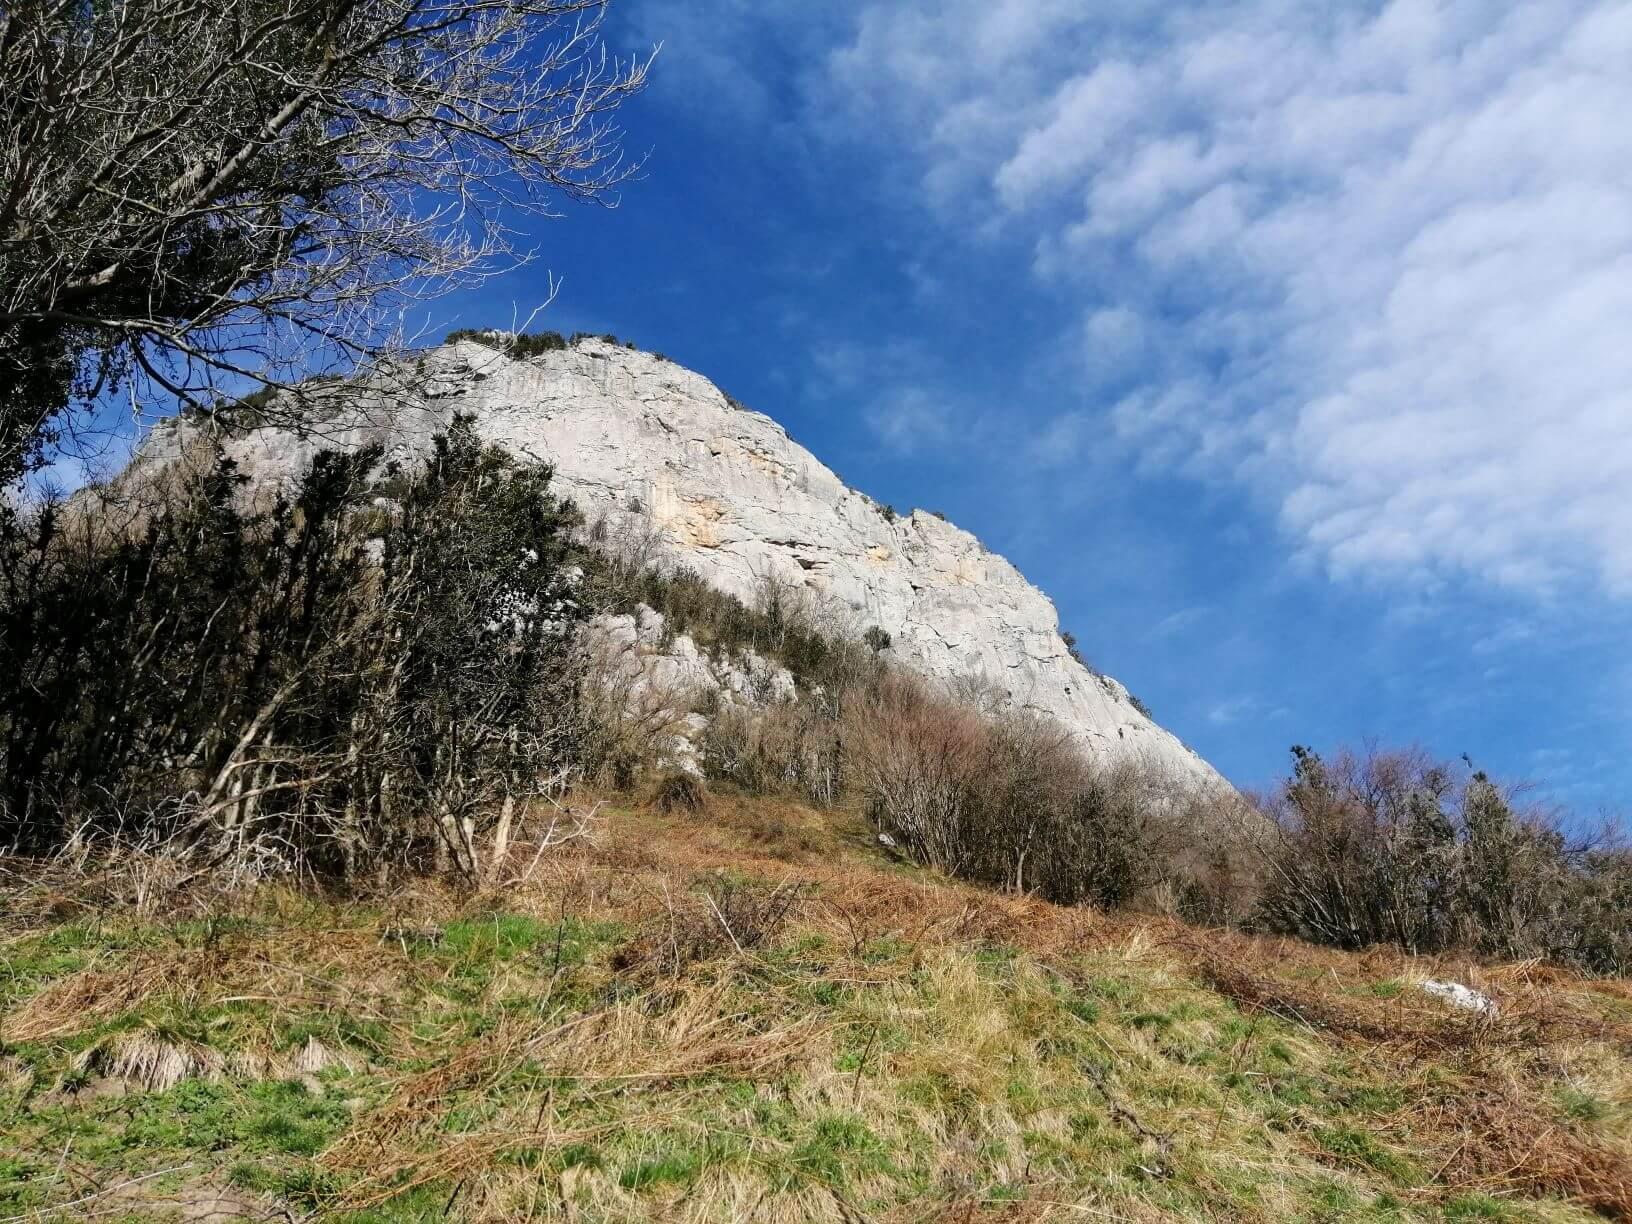 Secteur Perconoptère falaise d'escalade d'arguibelle